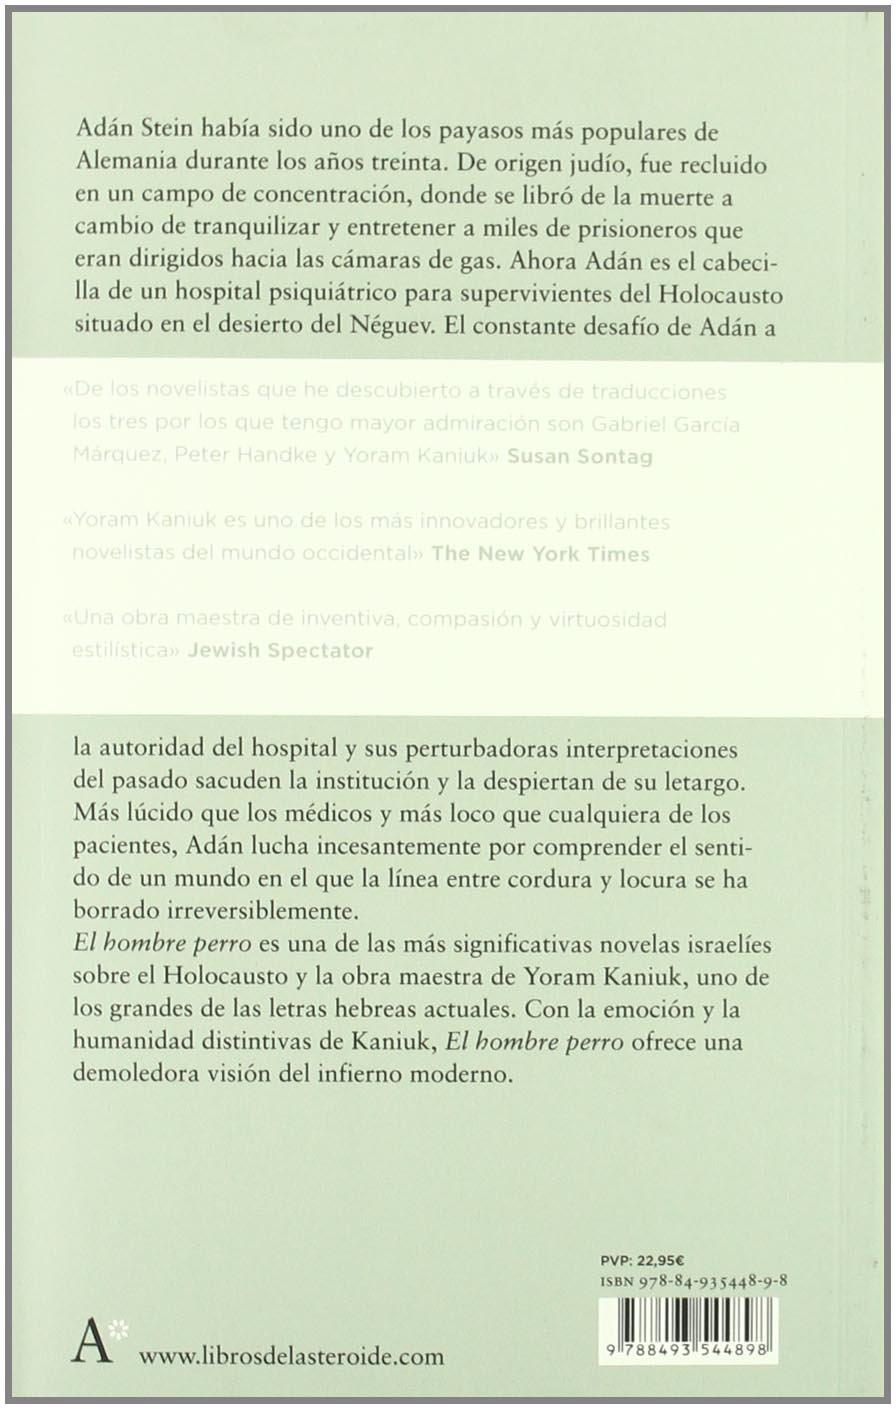 Amazon.com: El hombre perro (Spanish Edition) (9788493544898): Yoram Kaniuk, Gabi Martínez: Books